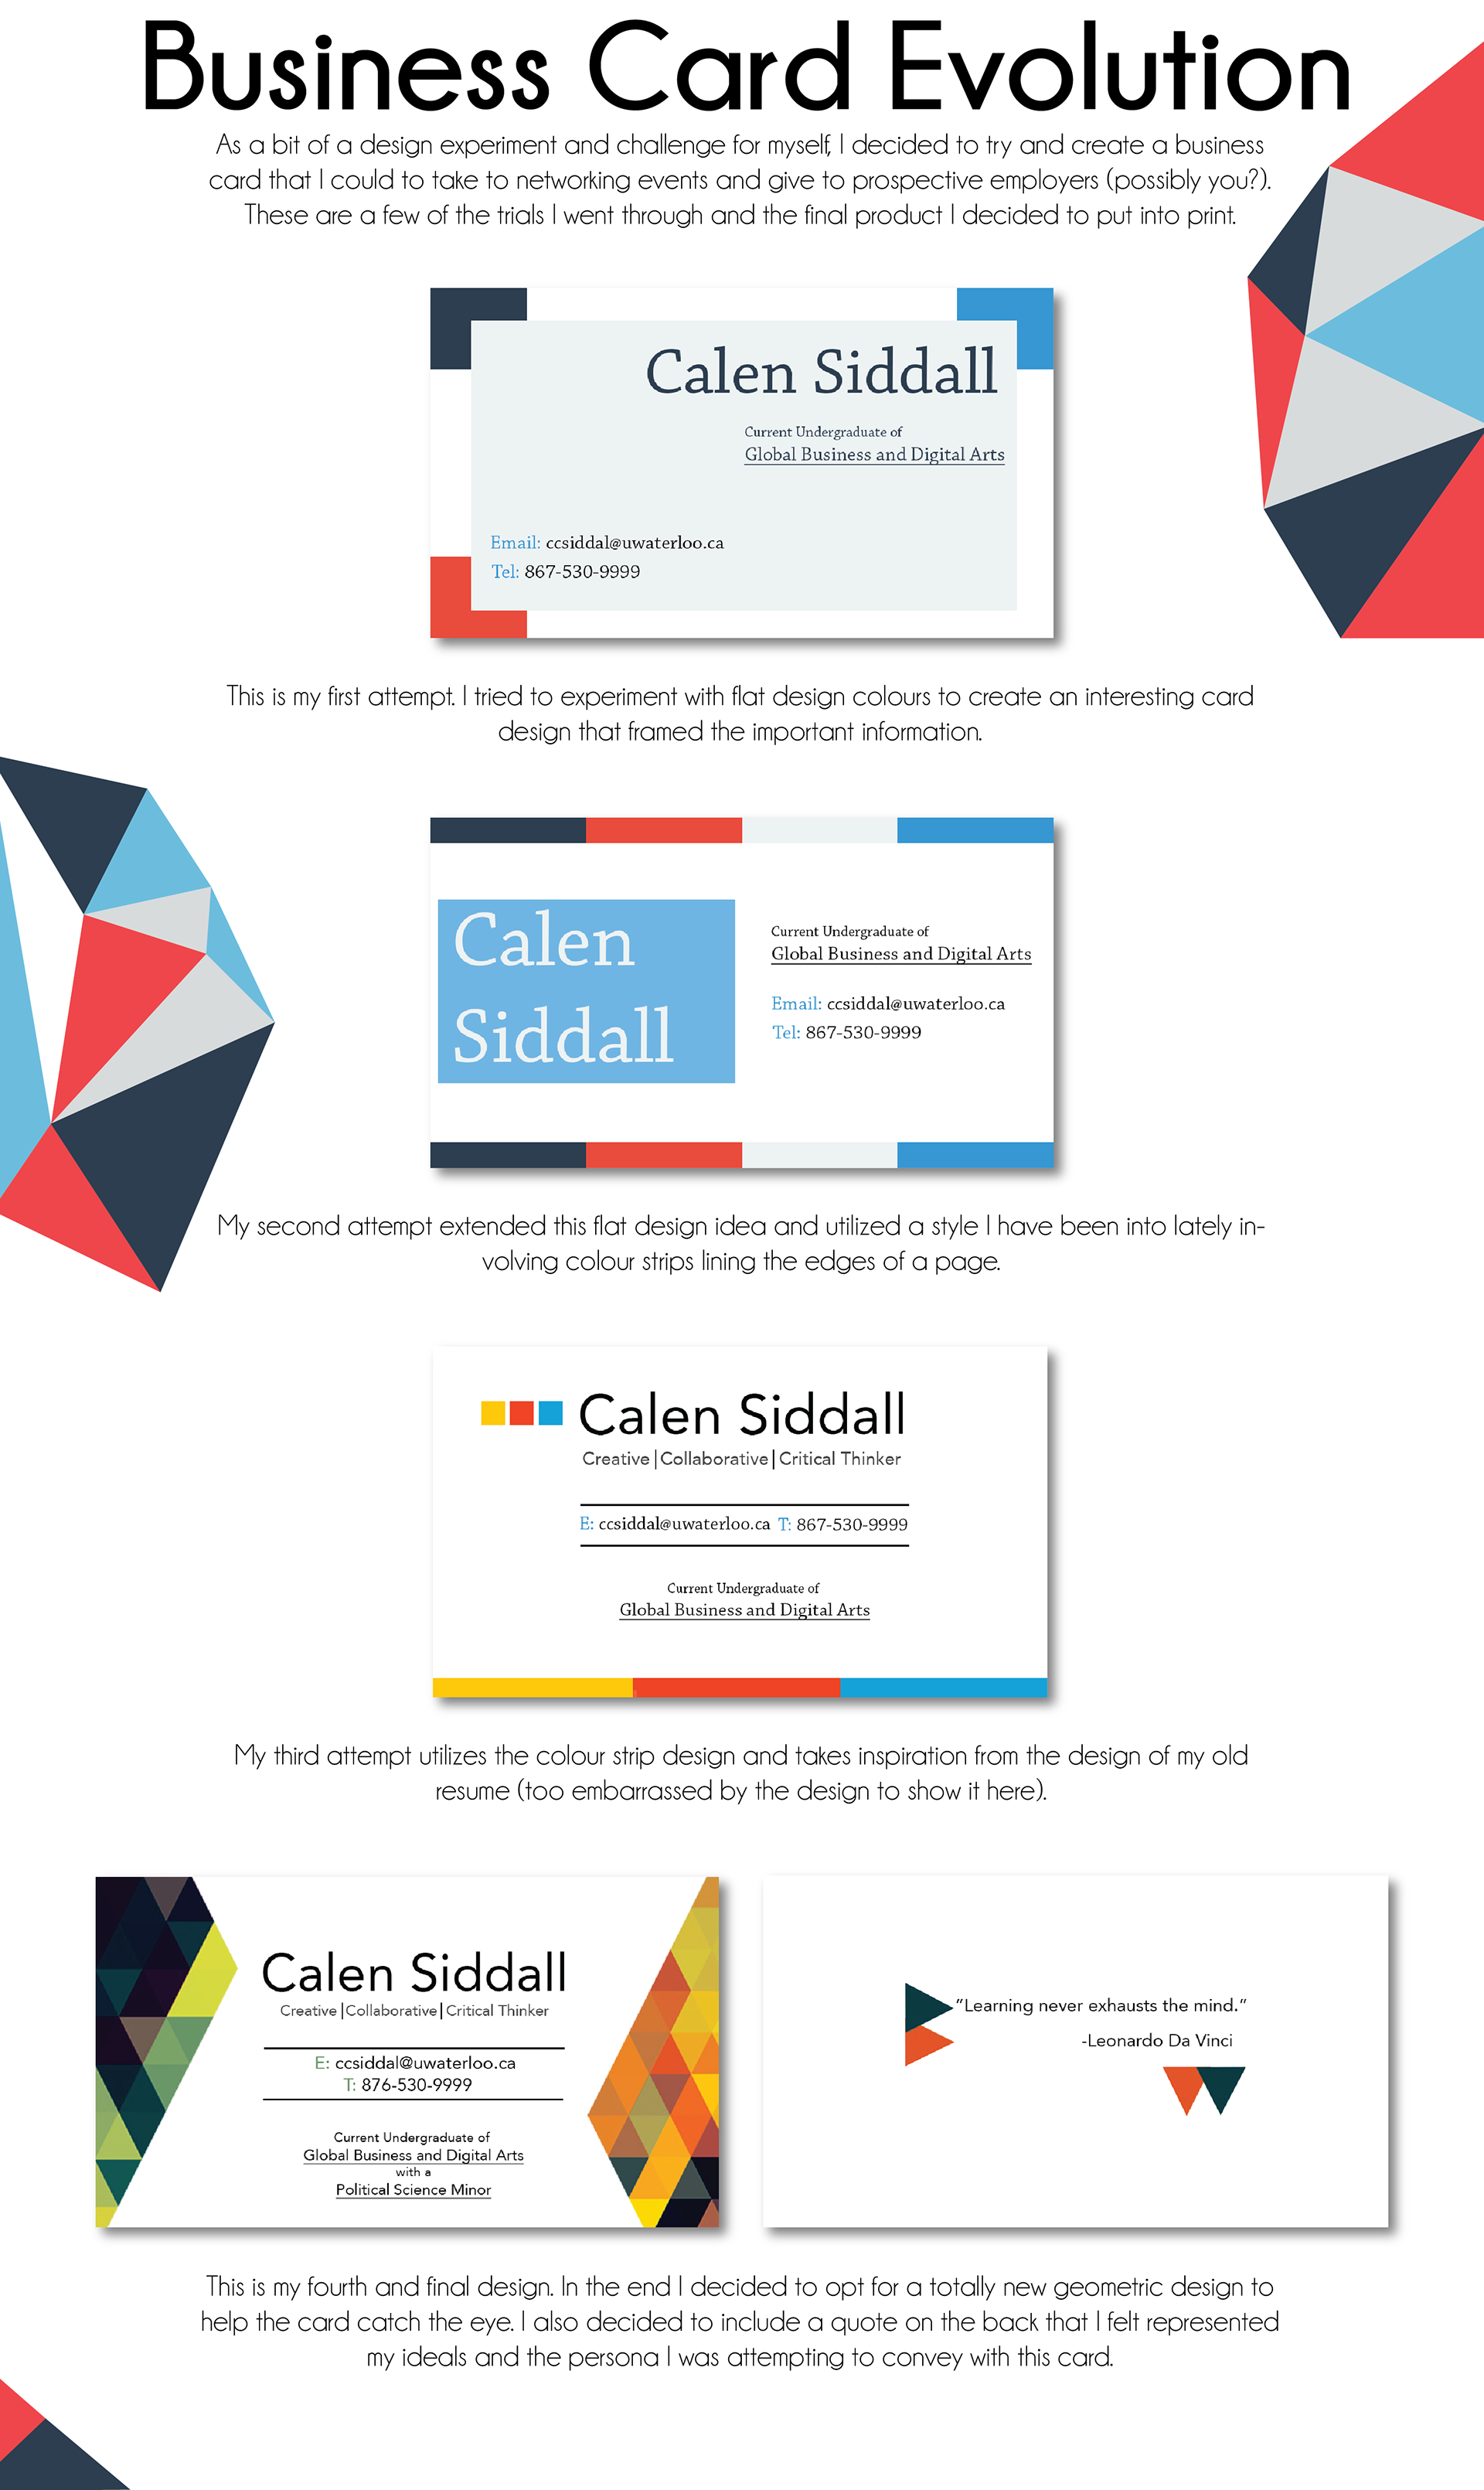 Calen siddall business card evolution colourmoves